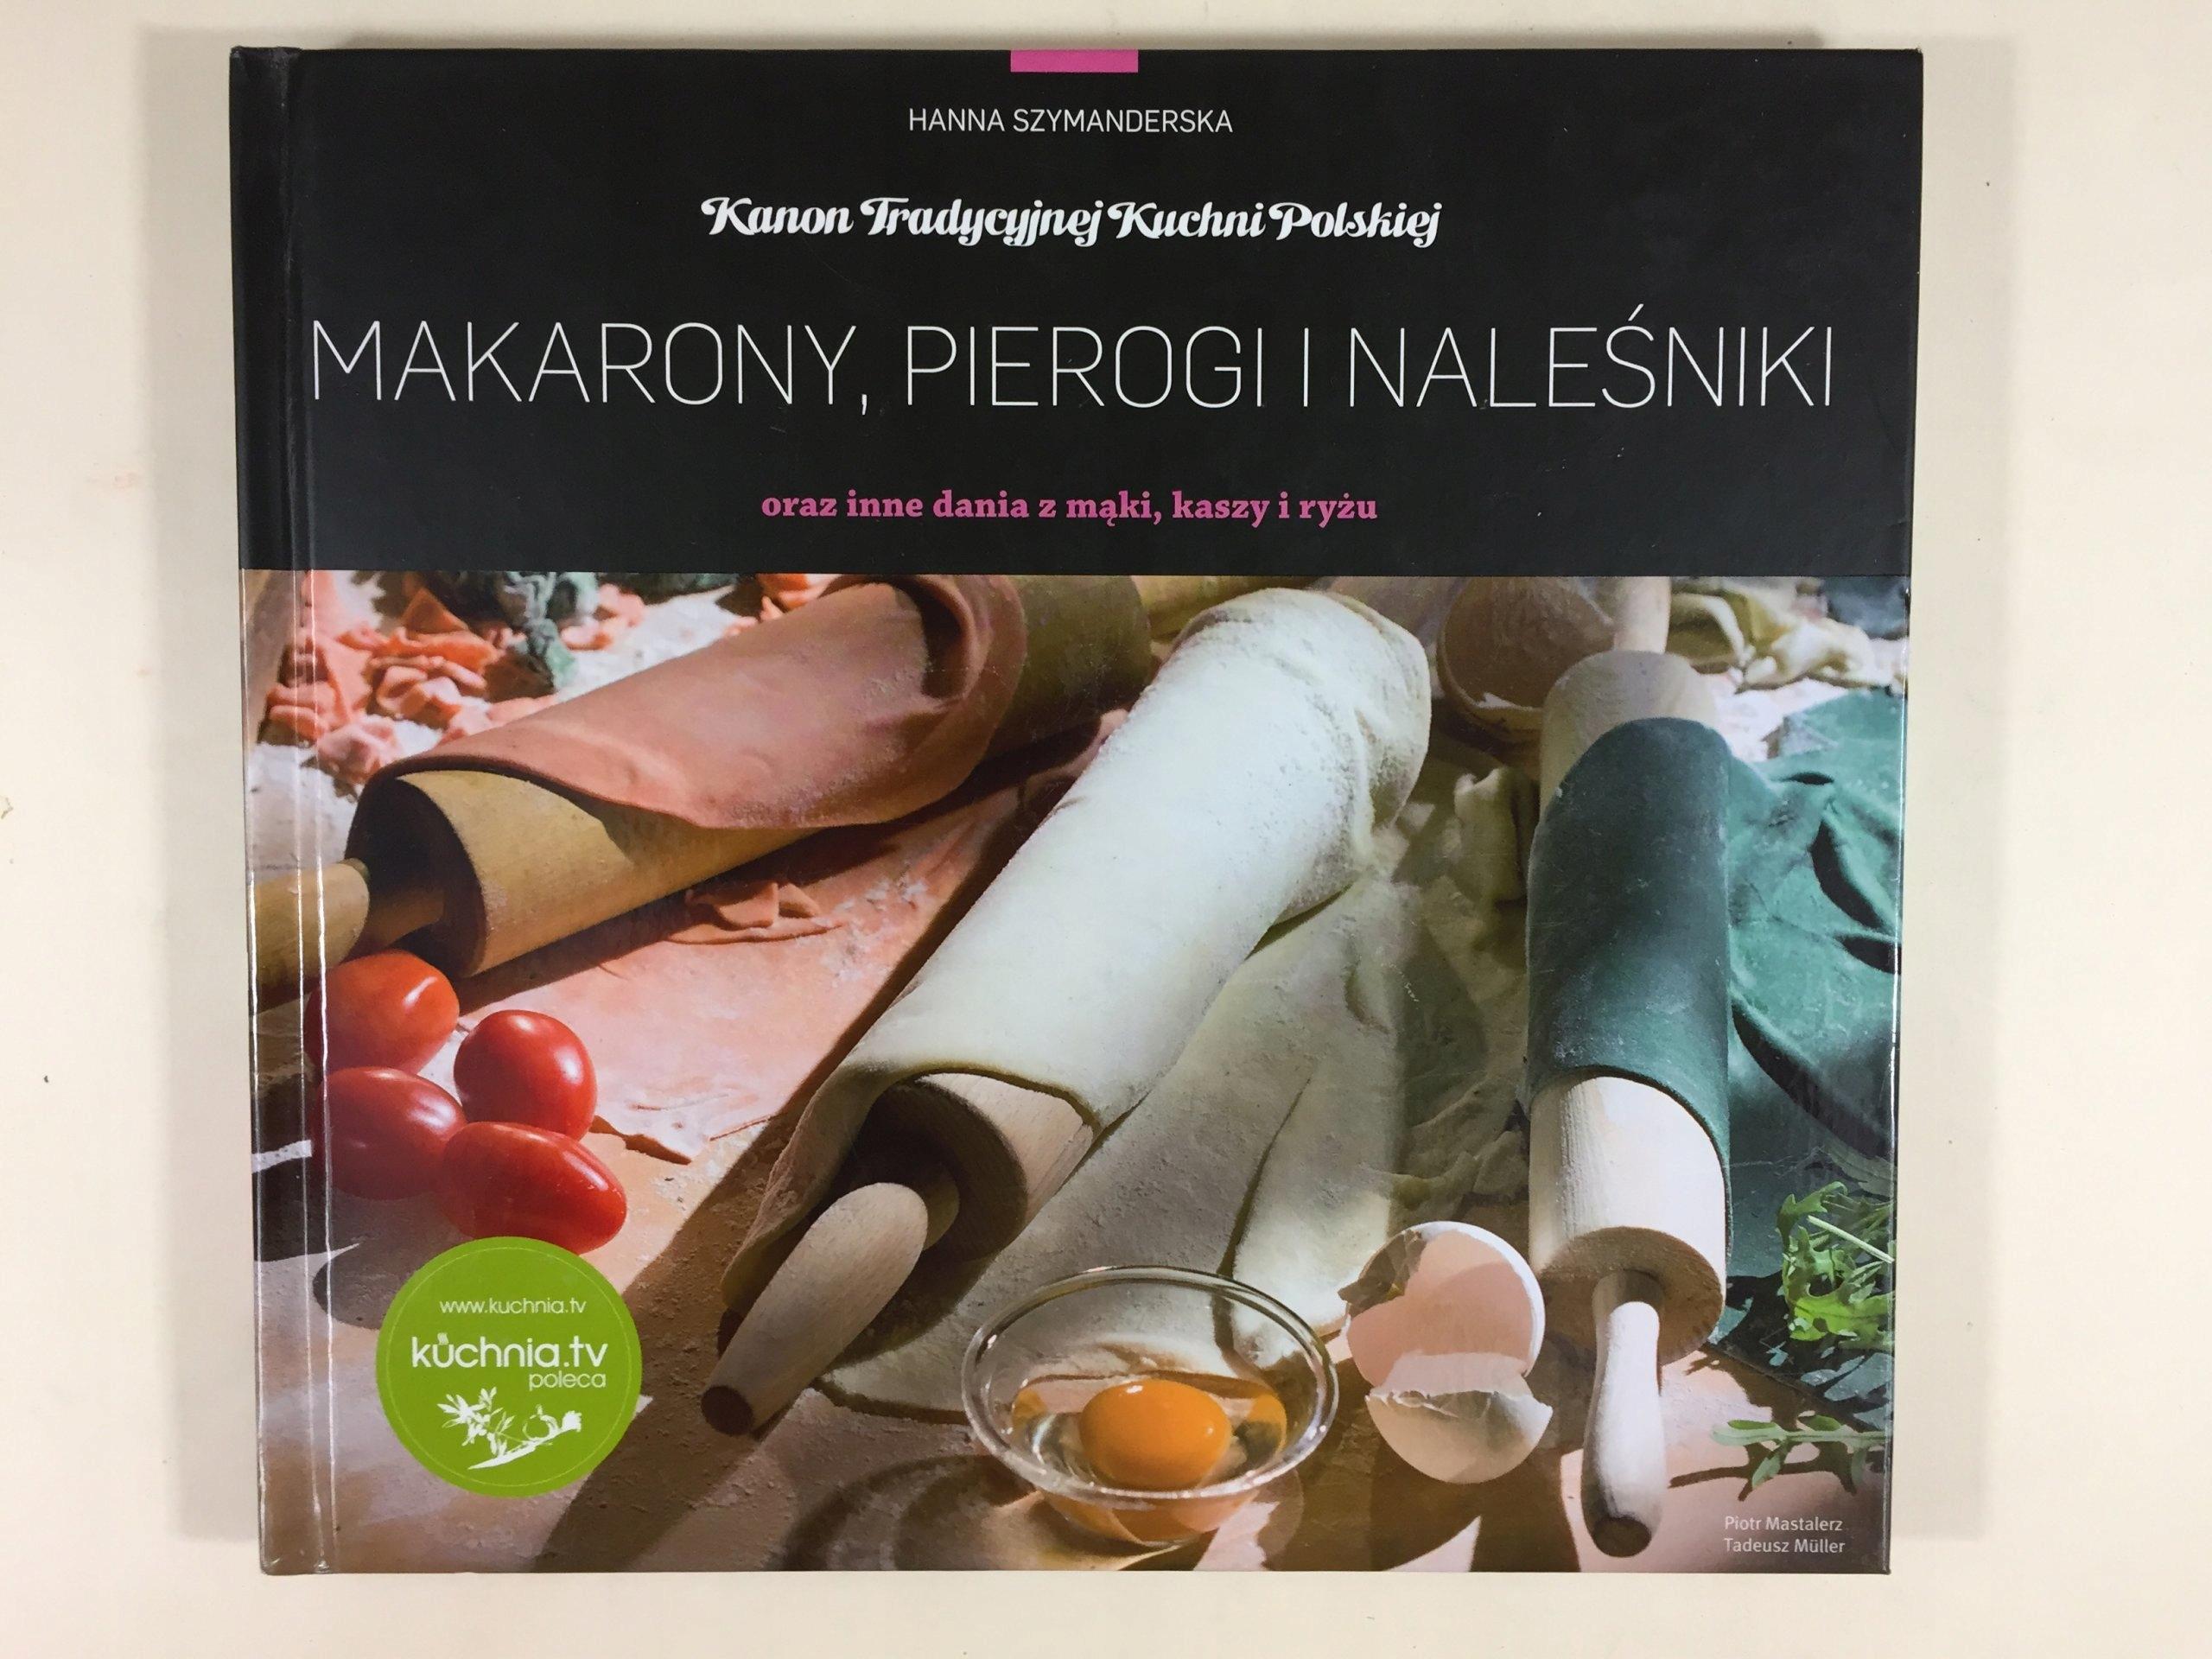 Makarony Pierogi I Nalesniki Hanna Szymanderska 6959019421